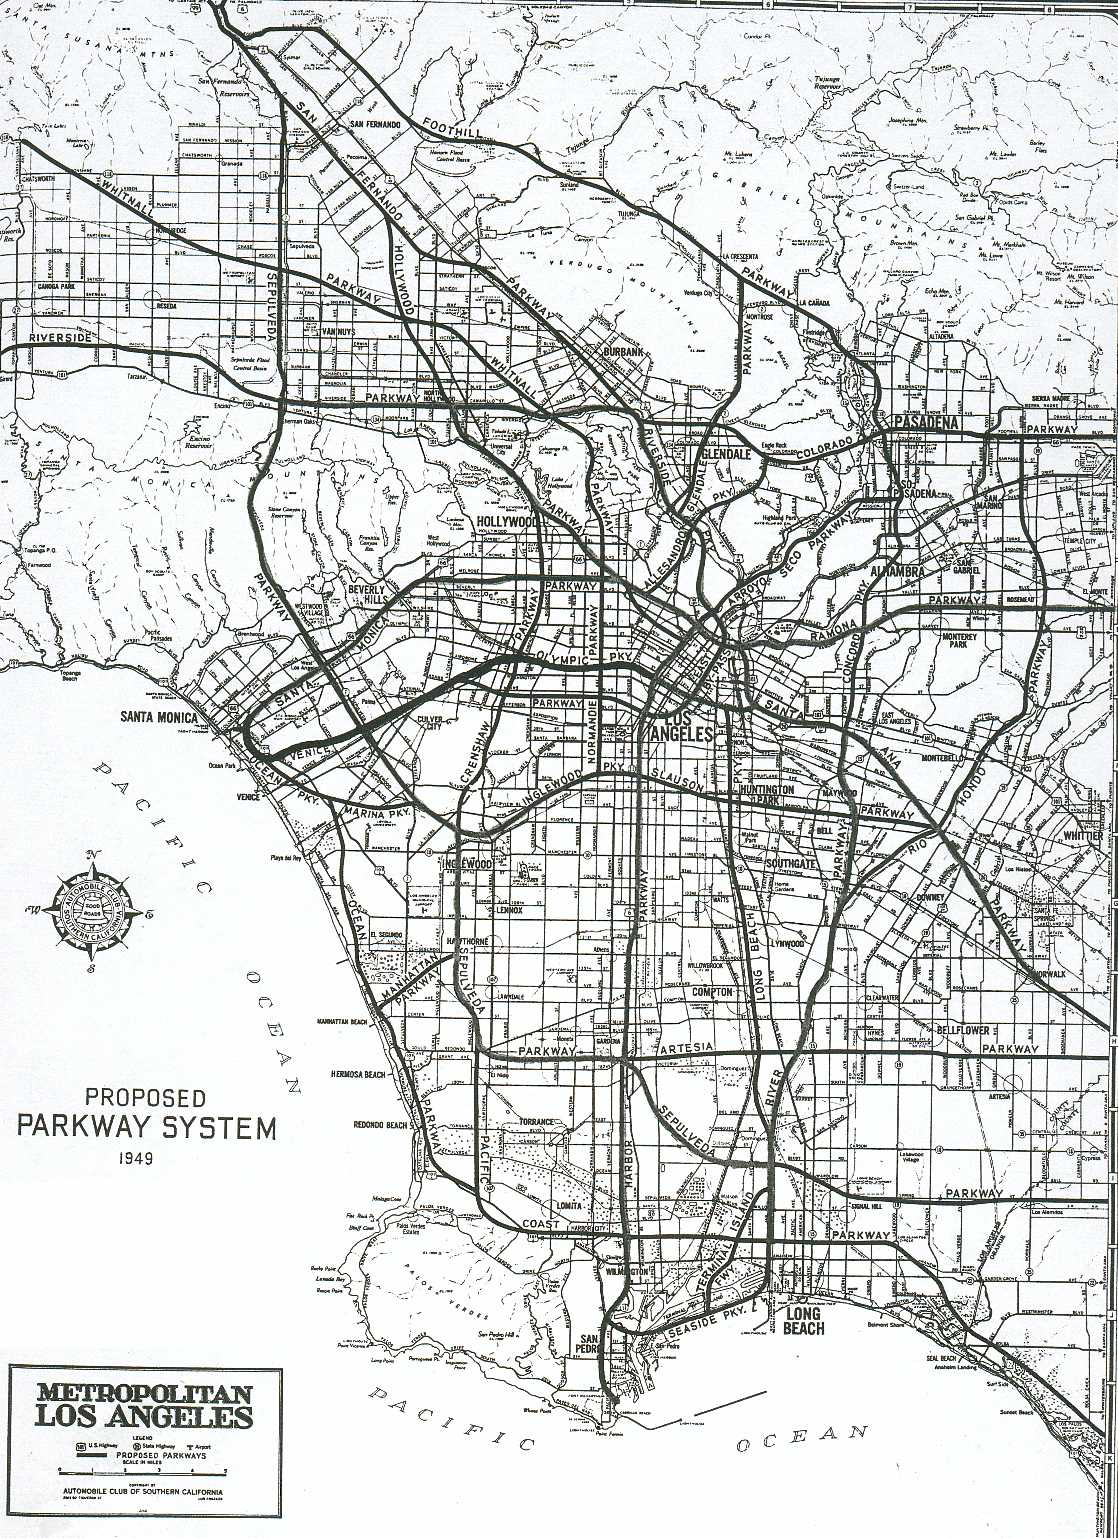 California highways cahighways southern california thumbnail 1949 acsc plan publicscrutiny Images